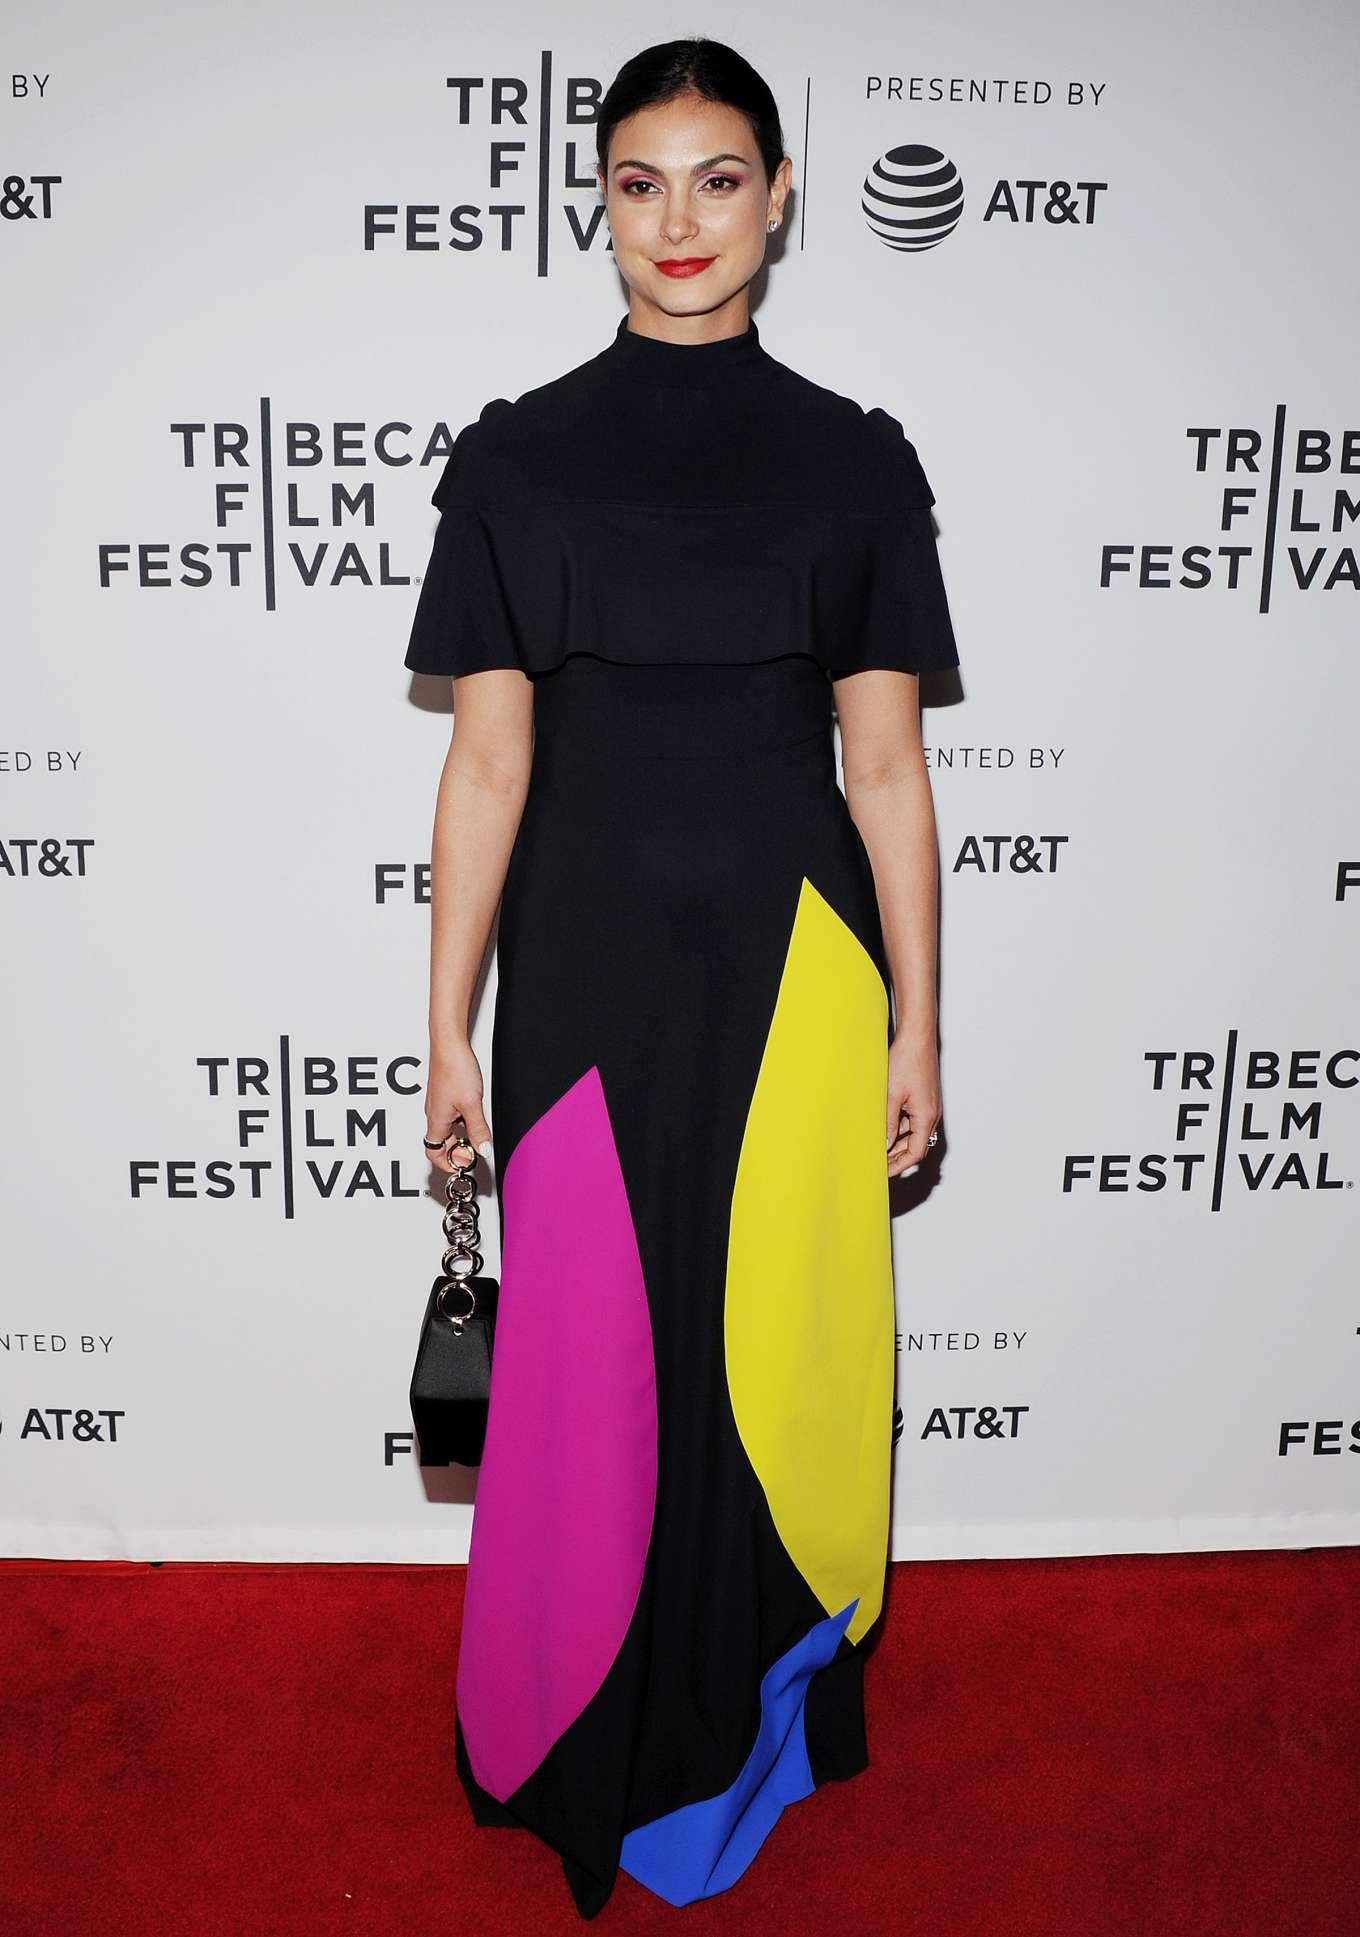 Morena Baccarin - 'Framing John DeLorean' Screening at 2019 Tribeca Film Festival in NYC